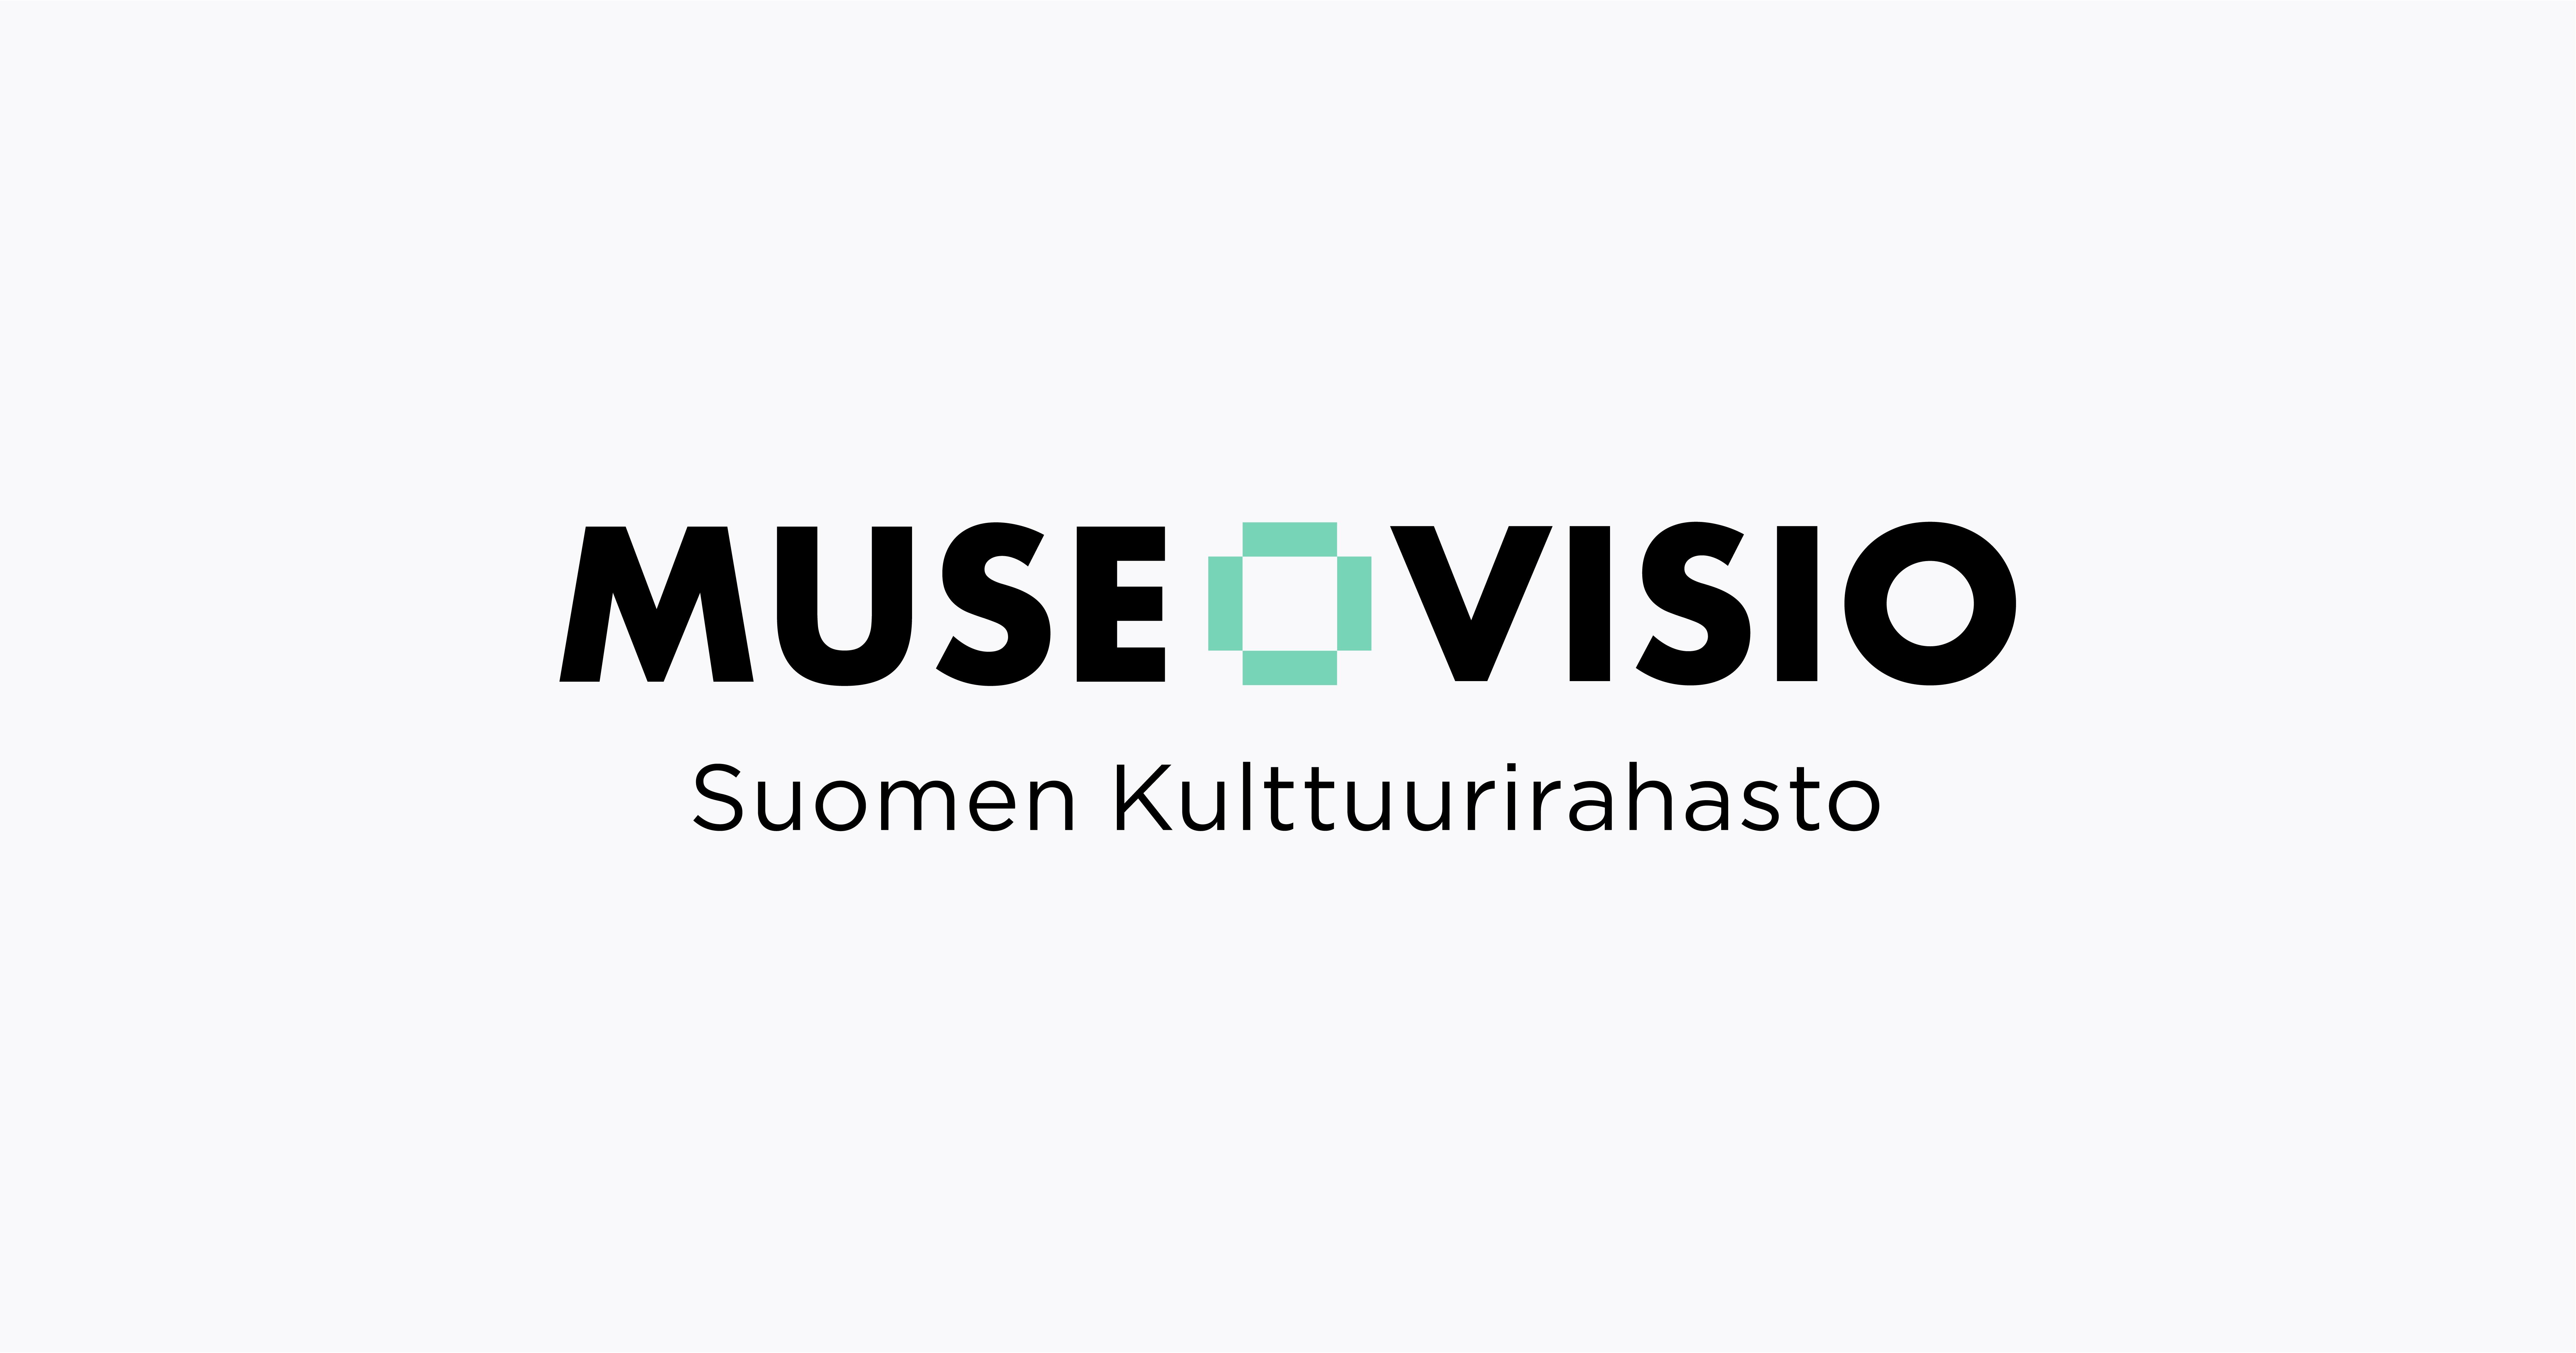 Museovisio_logo_1